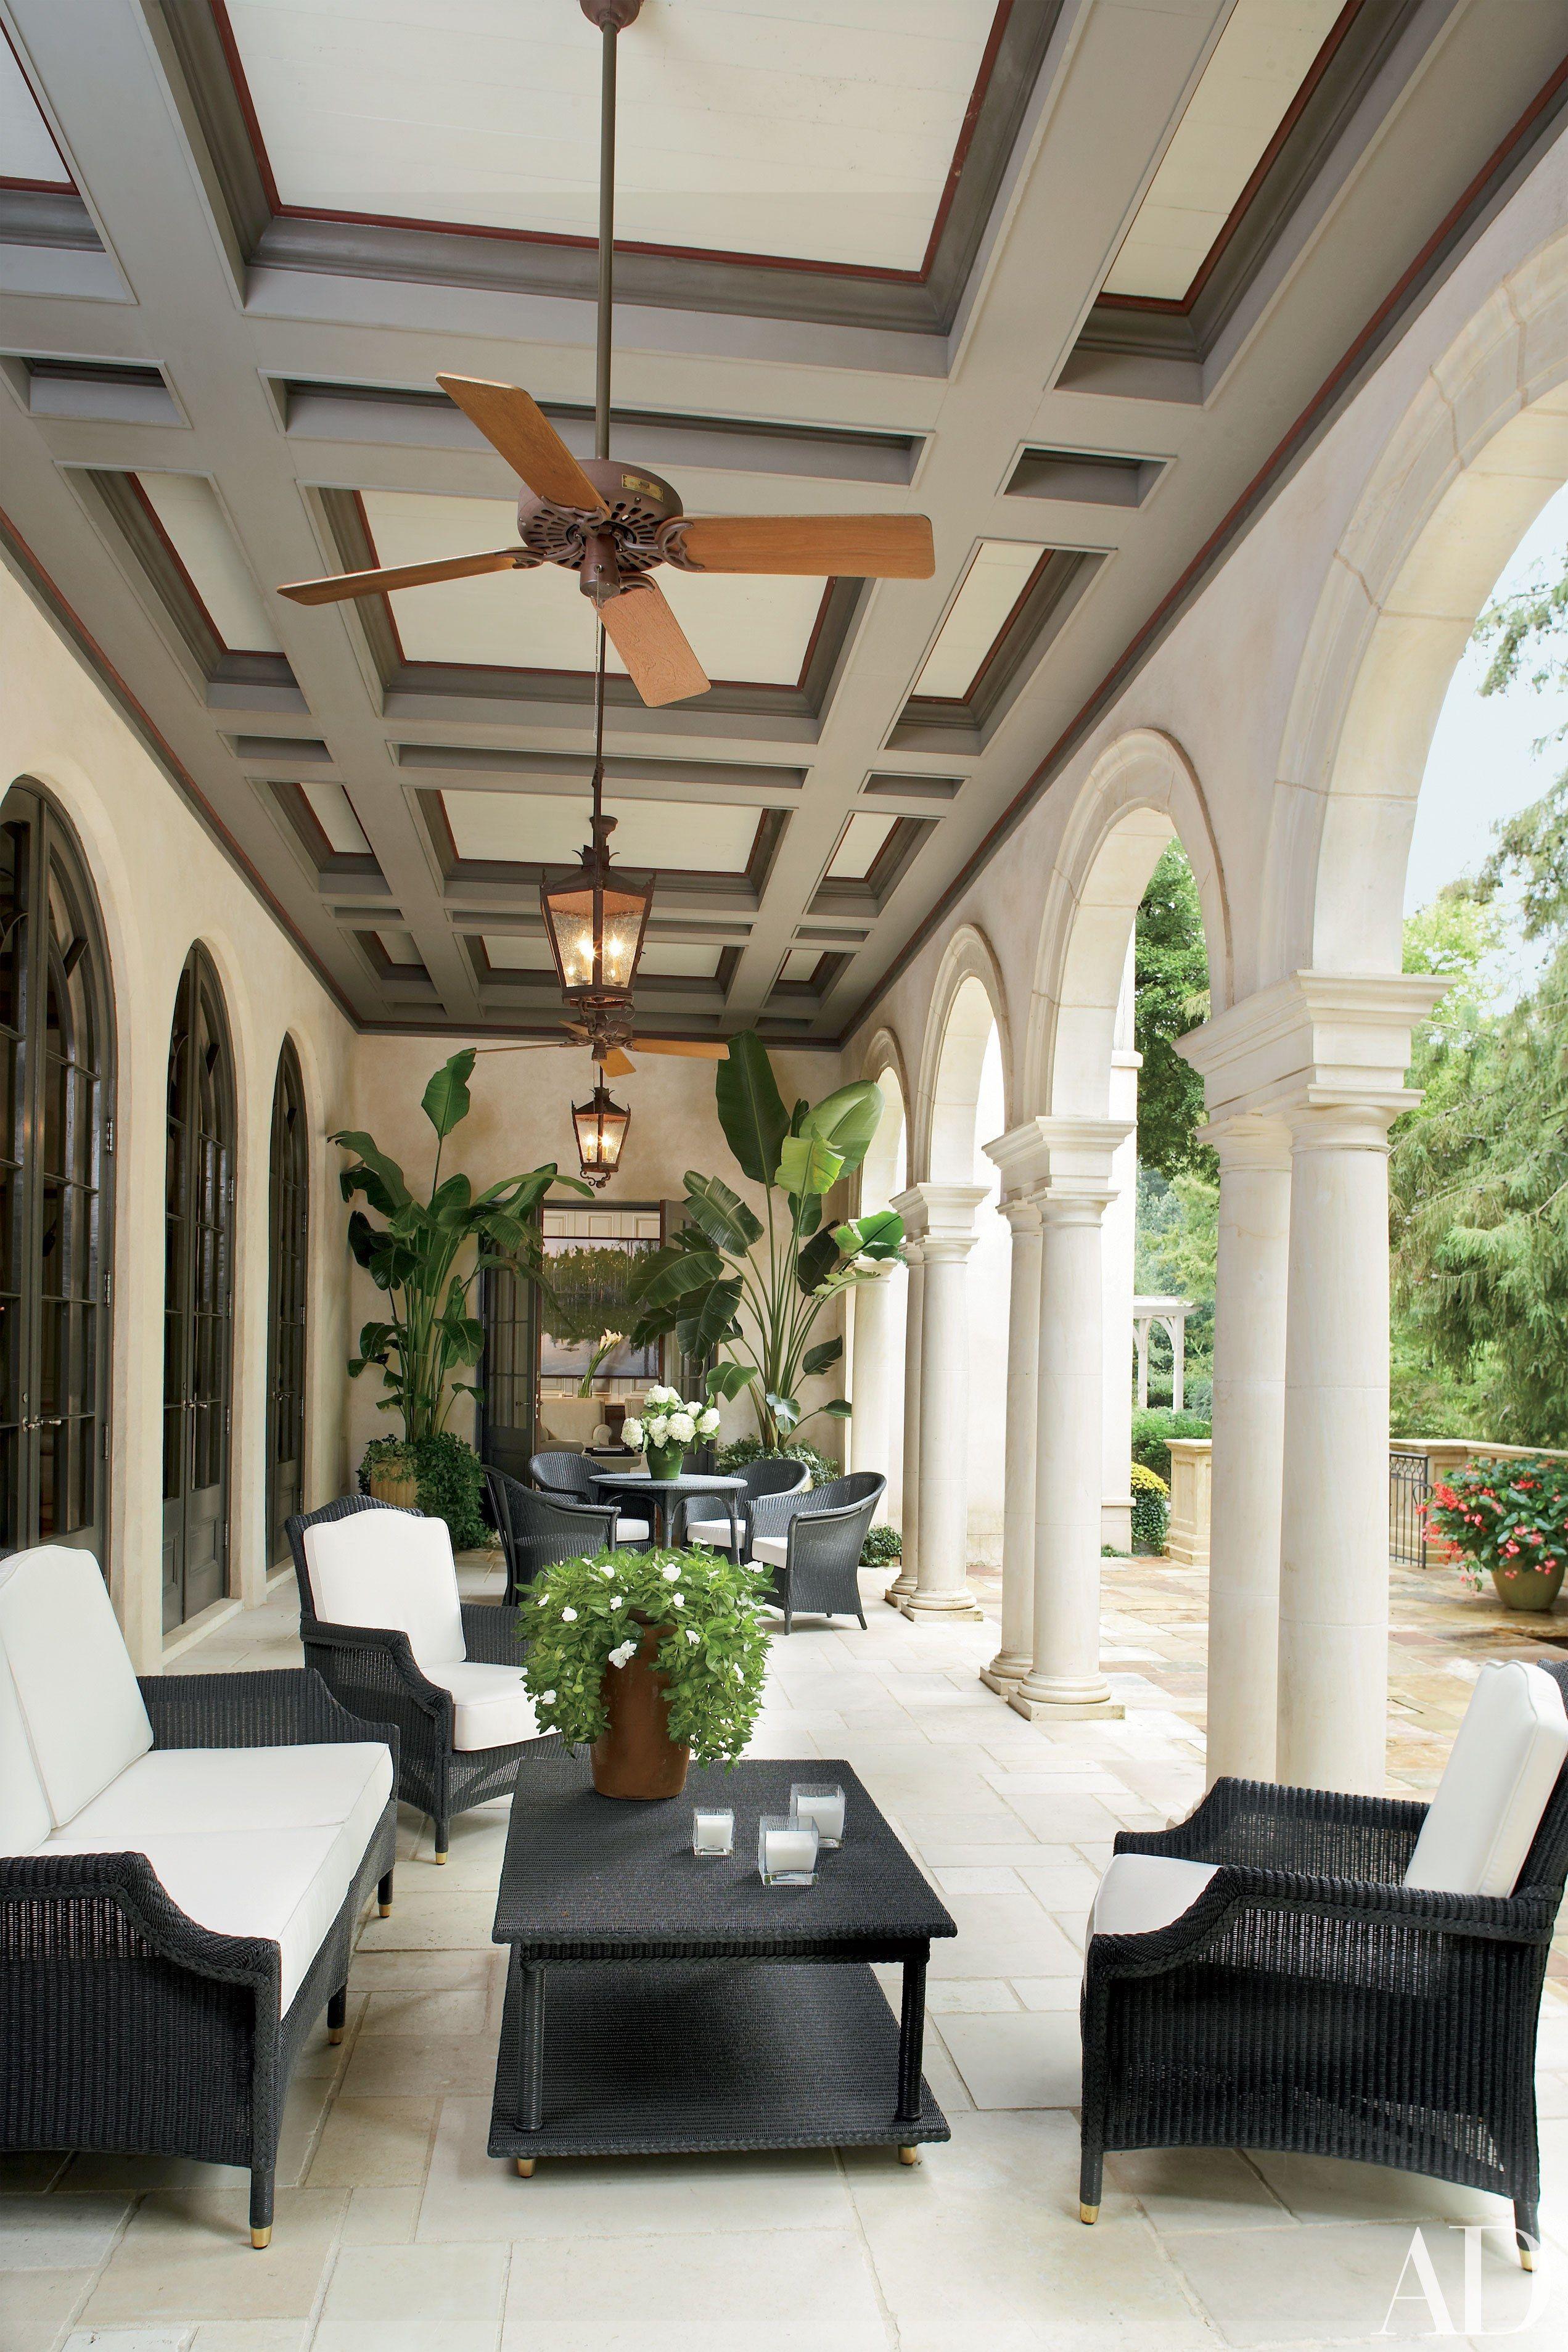 Home decor arch design photos architectural digest also chic designs that add timeless elegance in rh pinterest